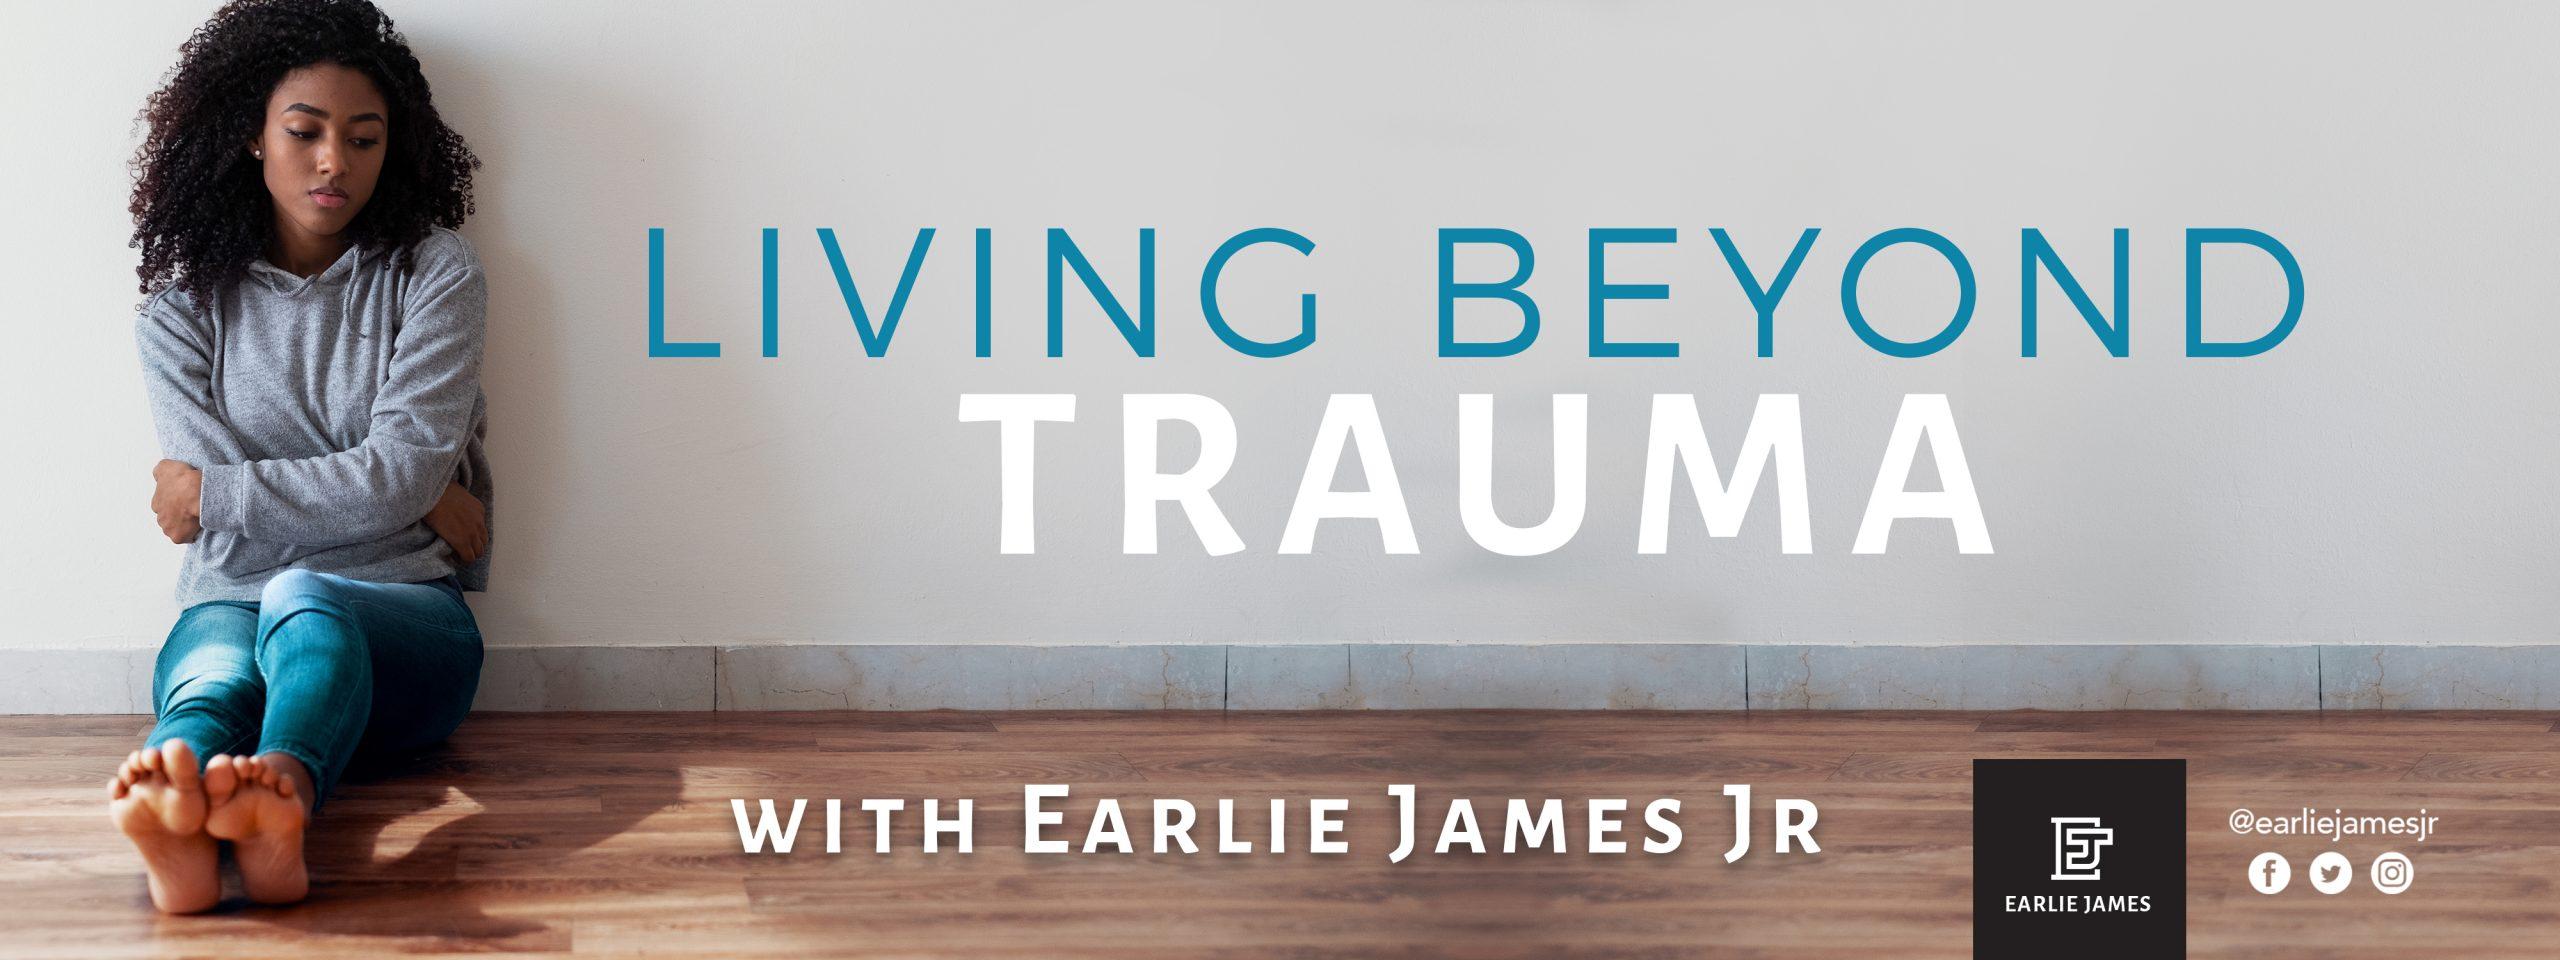 Beyond-Trauma-banner